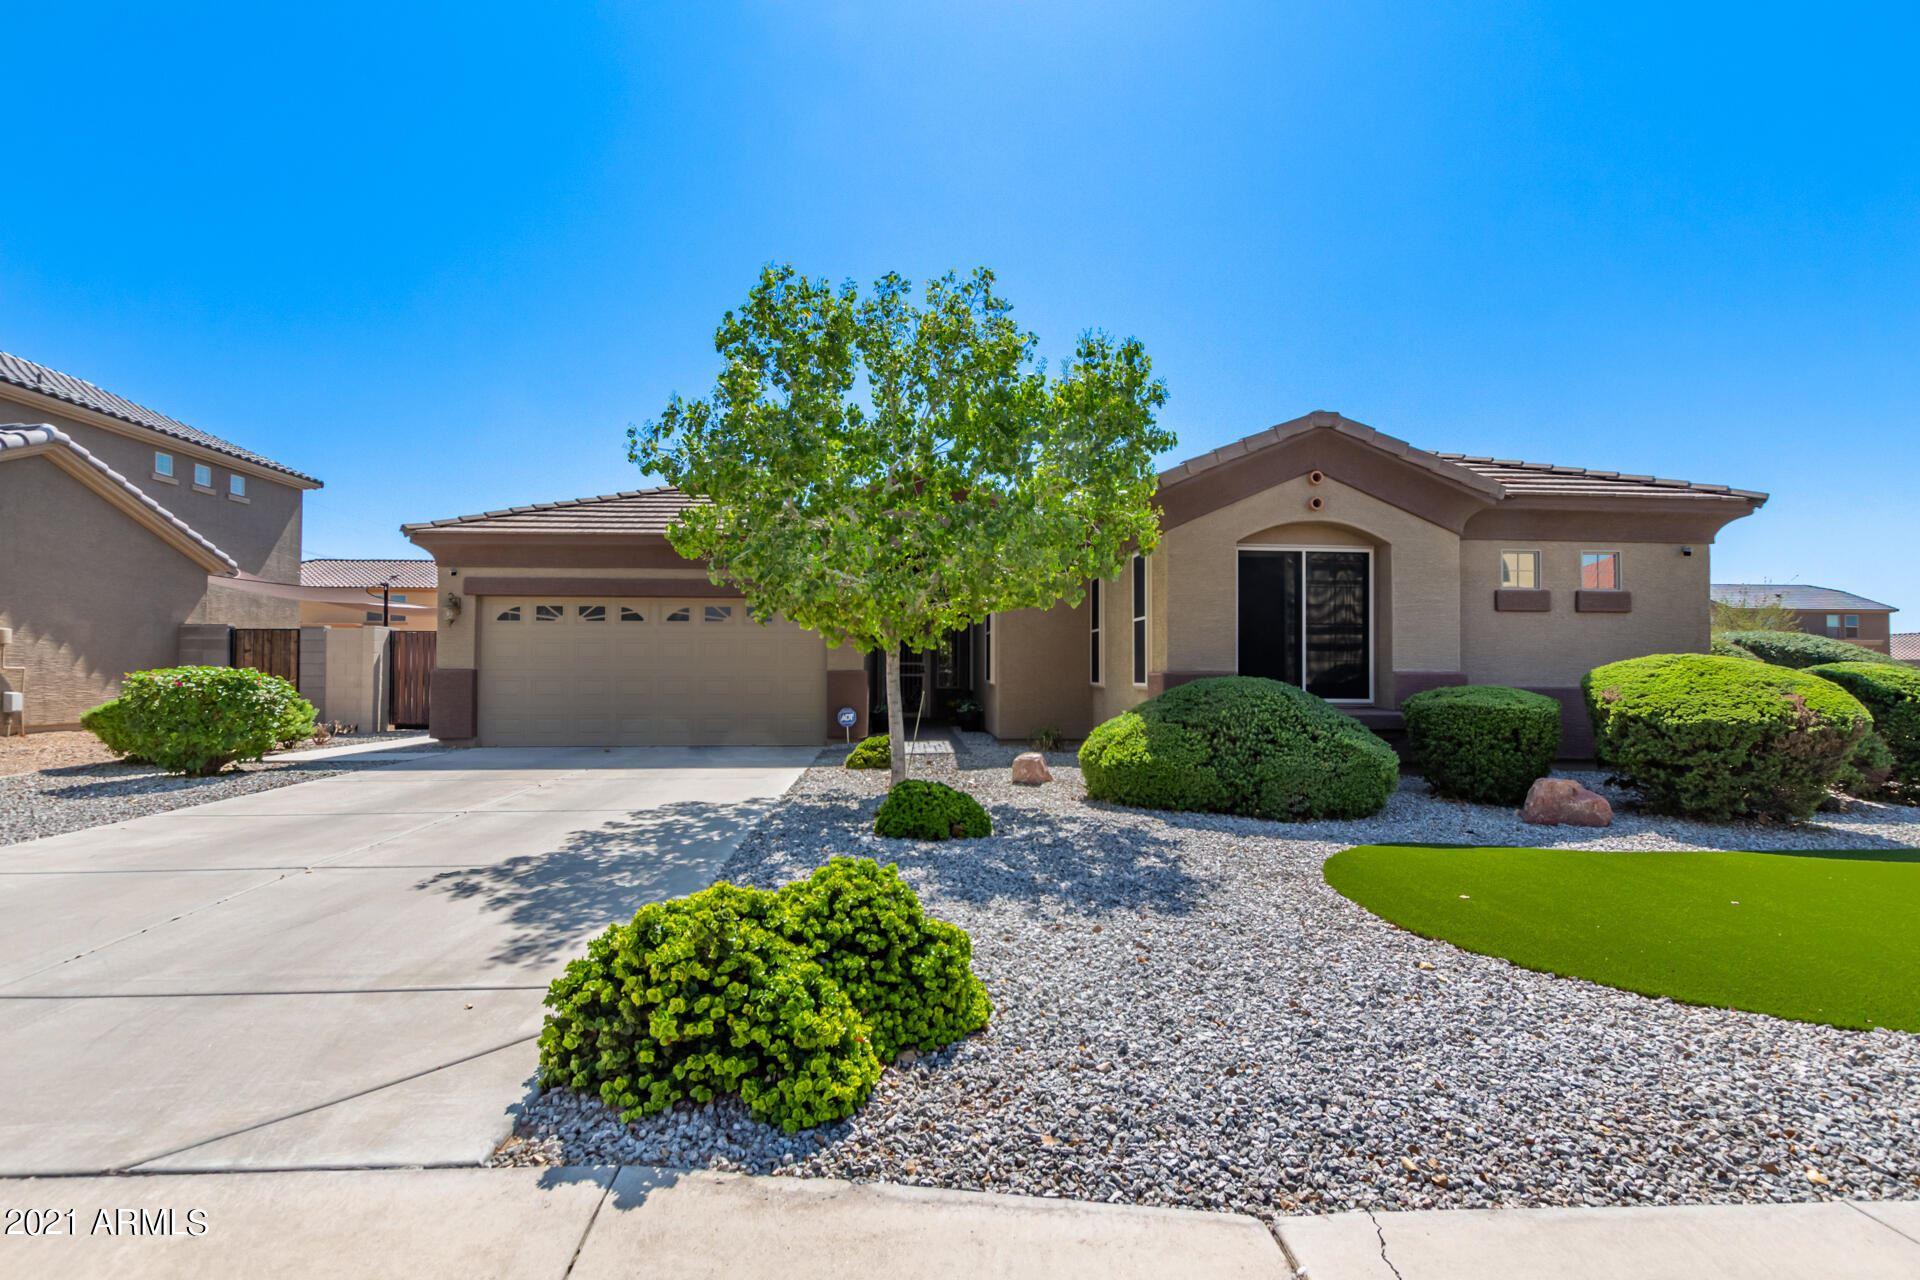 Photo of 12159 W PIONEER Street, Tolleson, AZ 85353 (MLS # 6302558)